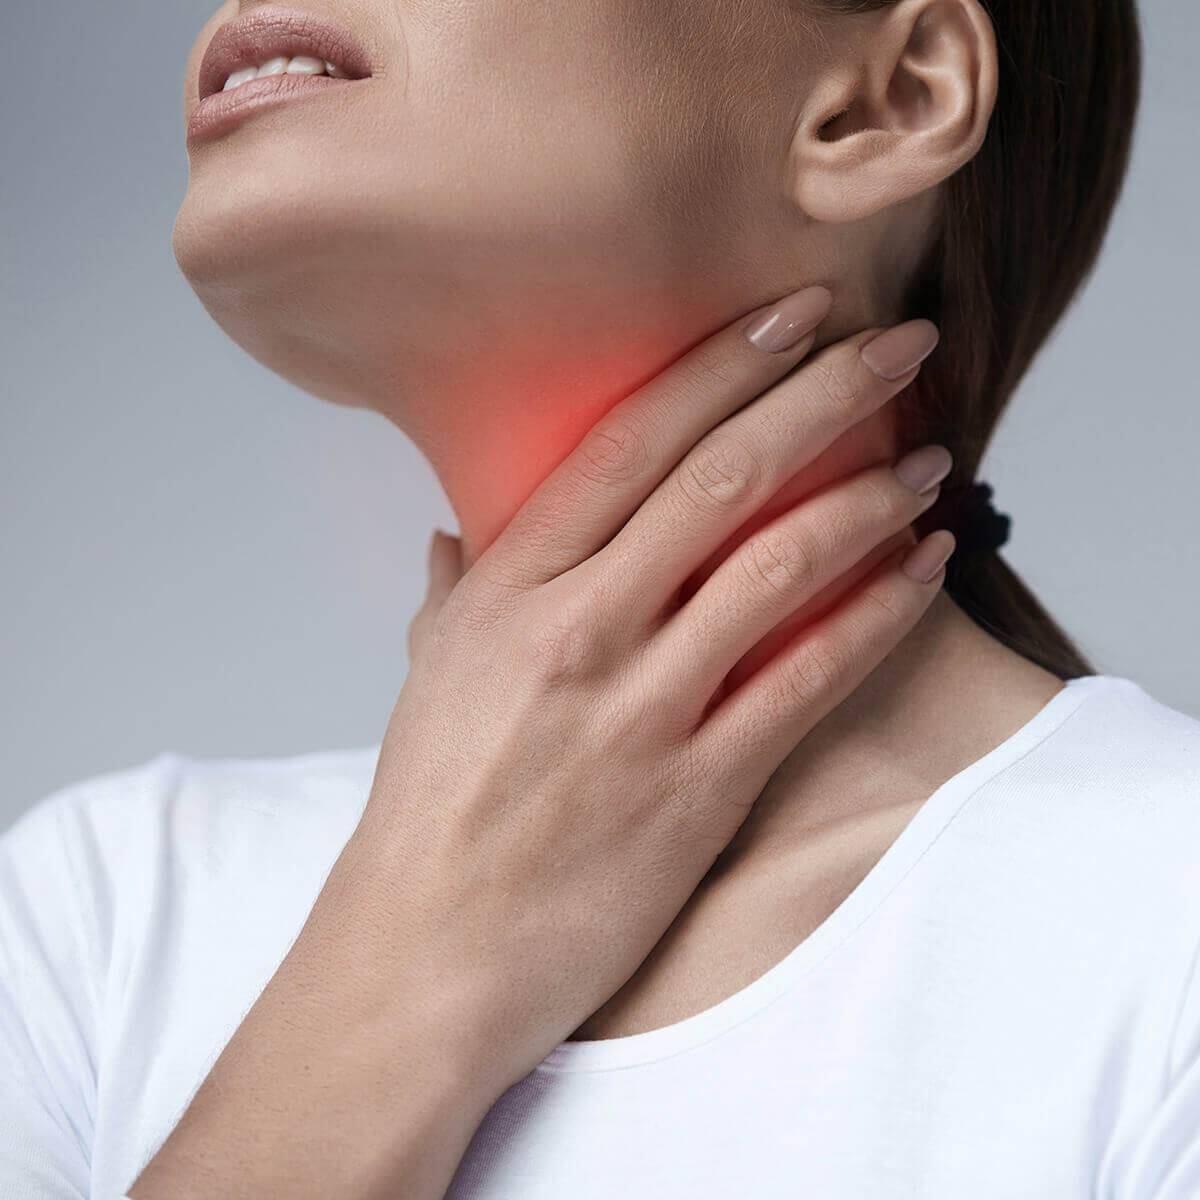 Избавляемся от боли в носоглотке